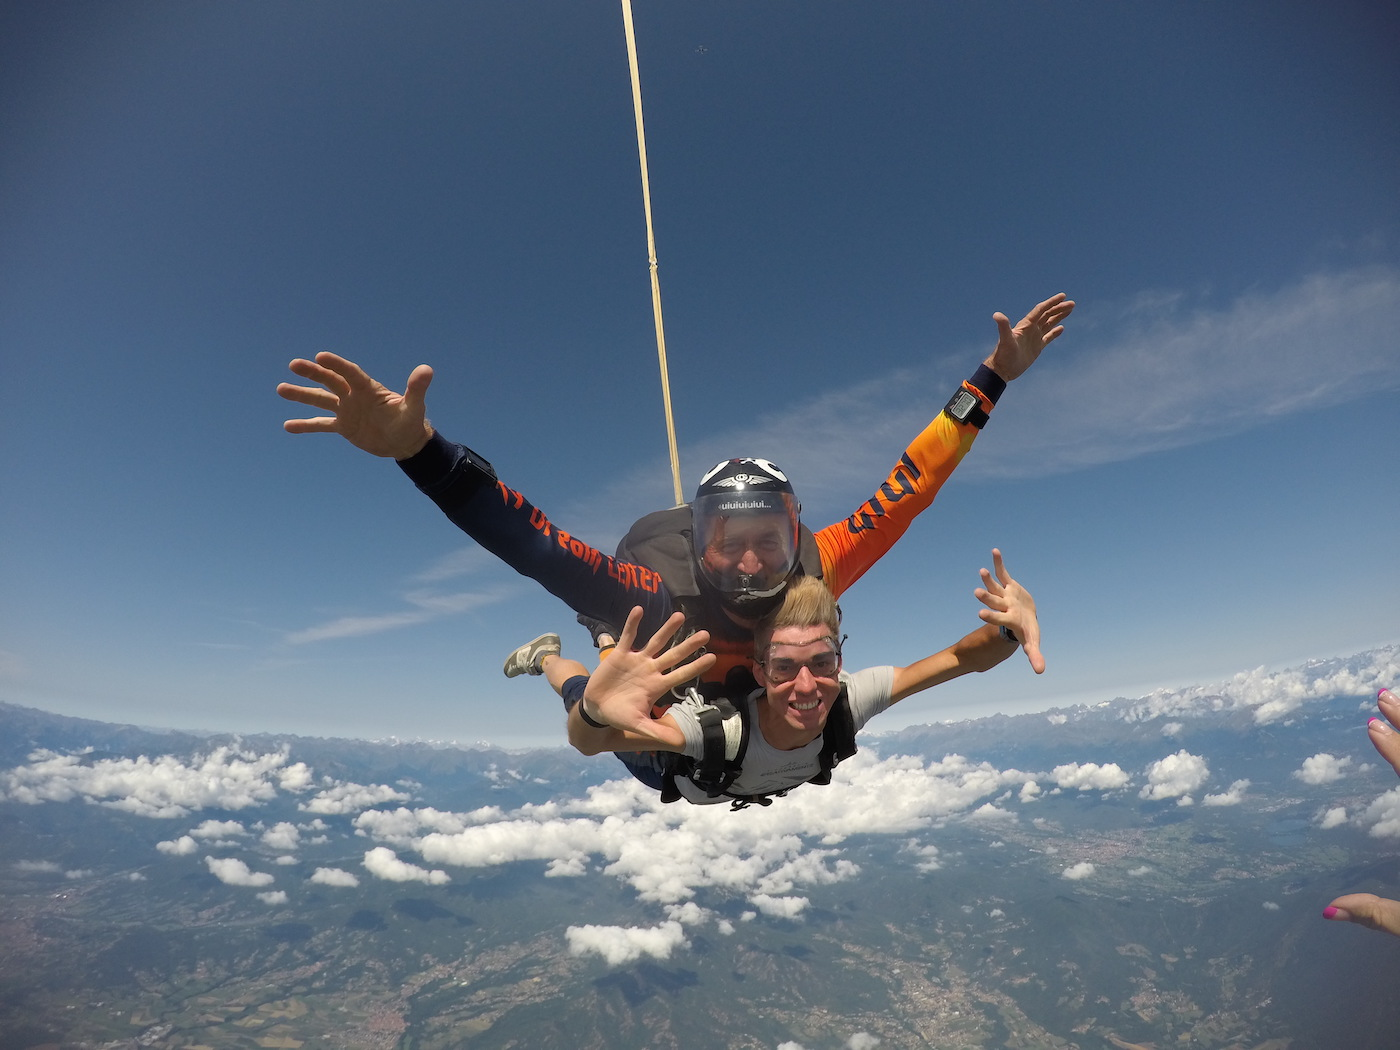 lancio tandem col paracadute